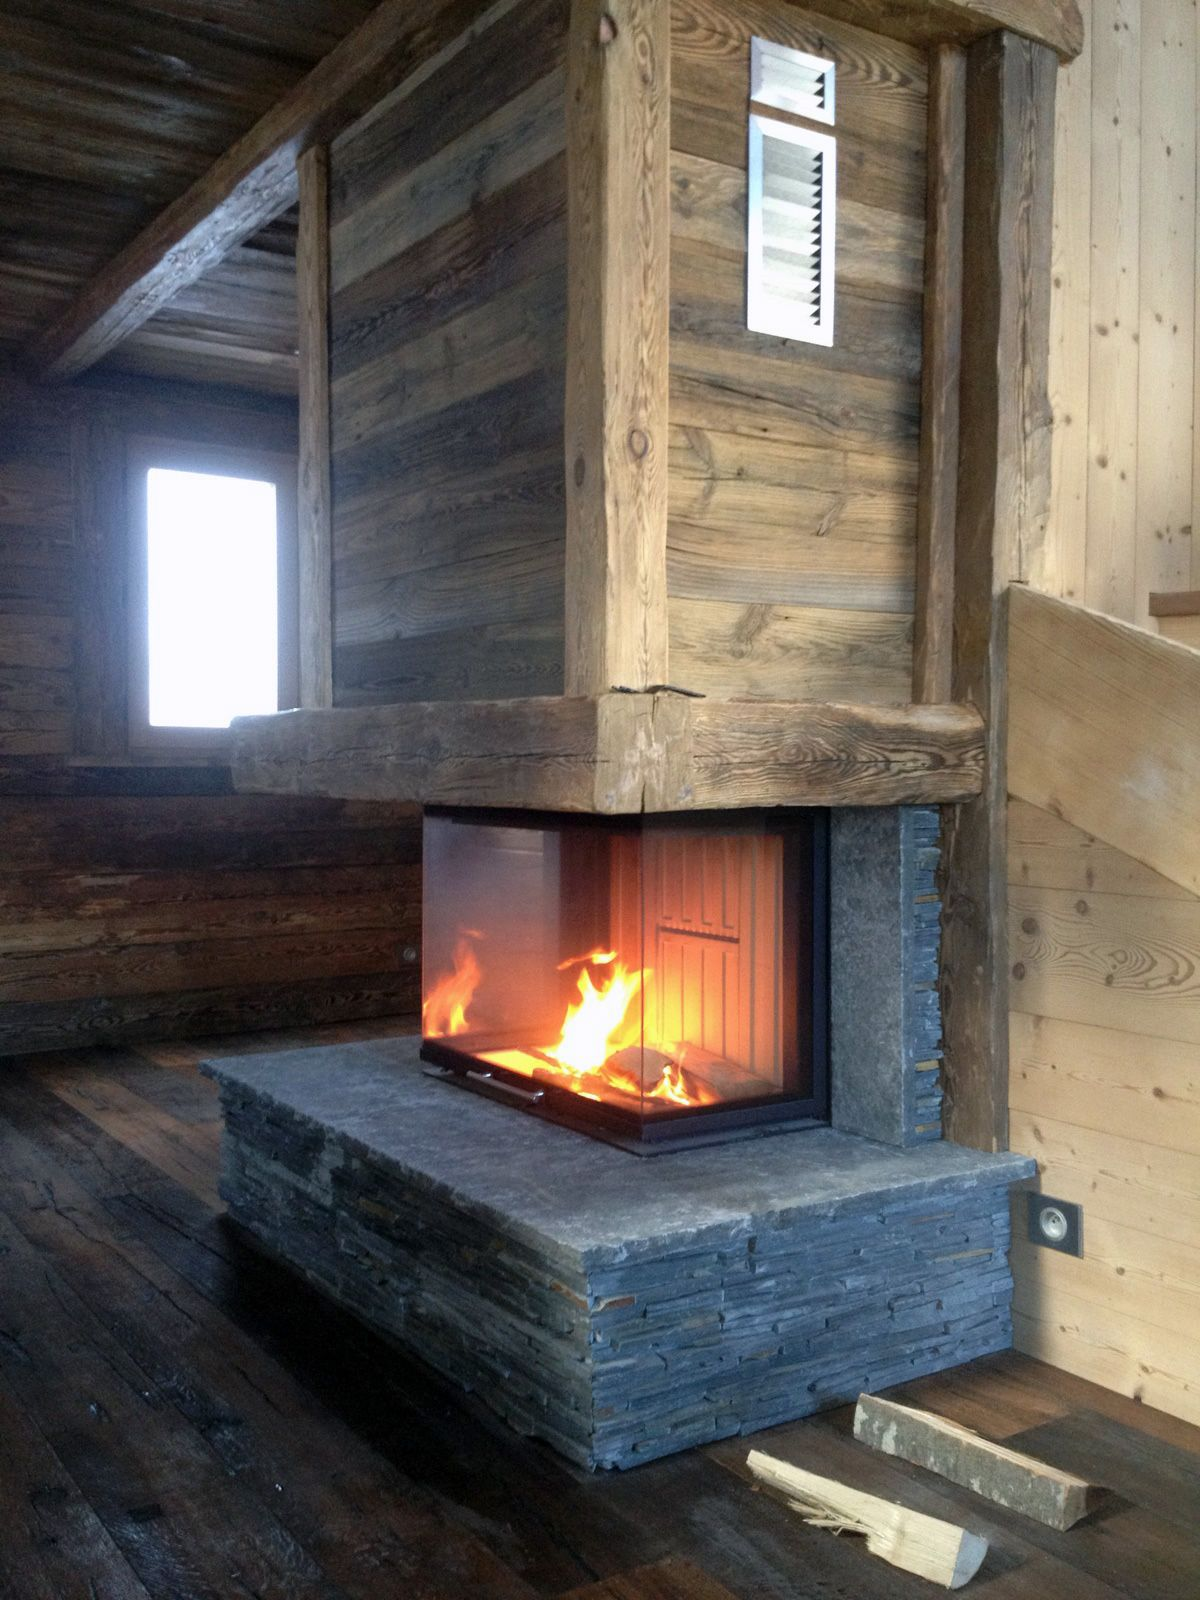 vitres pour cheminees bois chemin e 3 vitres chemin e 3. Black Bedroom Furniture Sets. Home Design Ideas